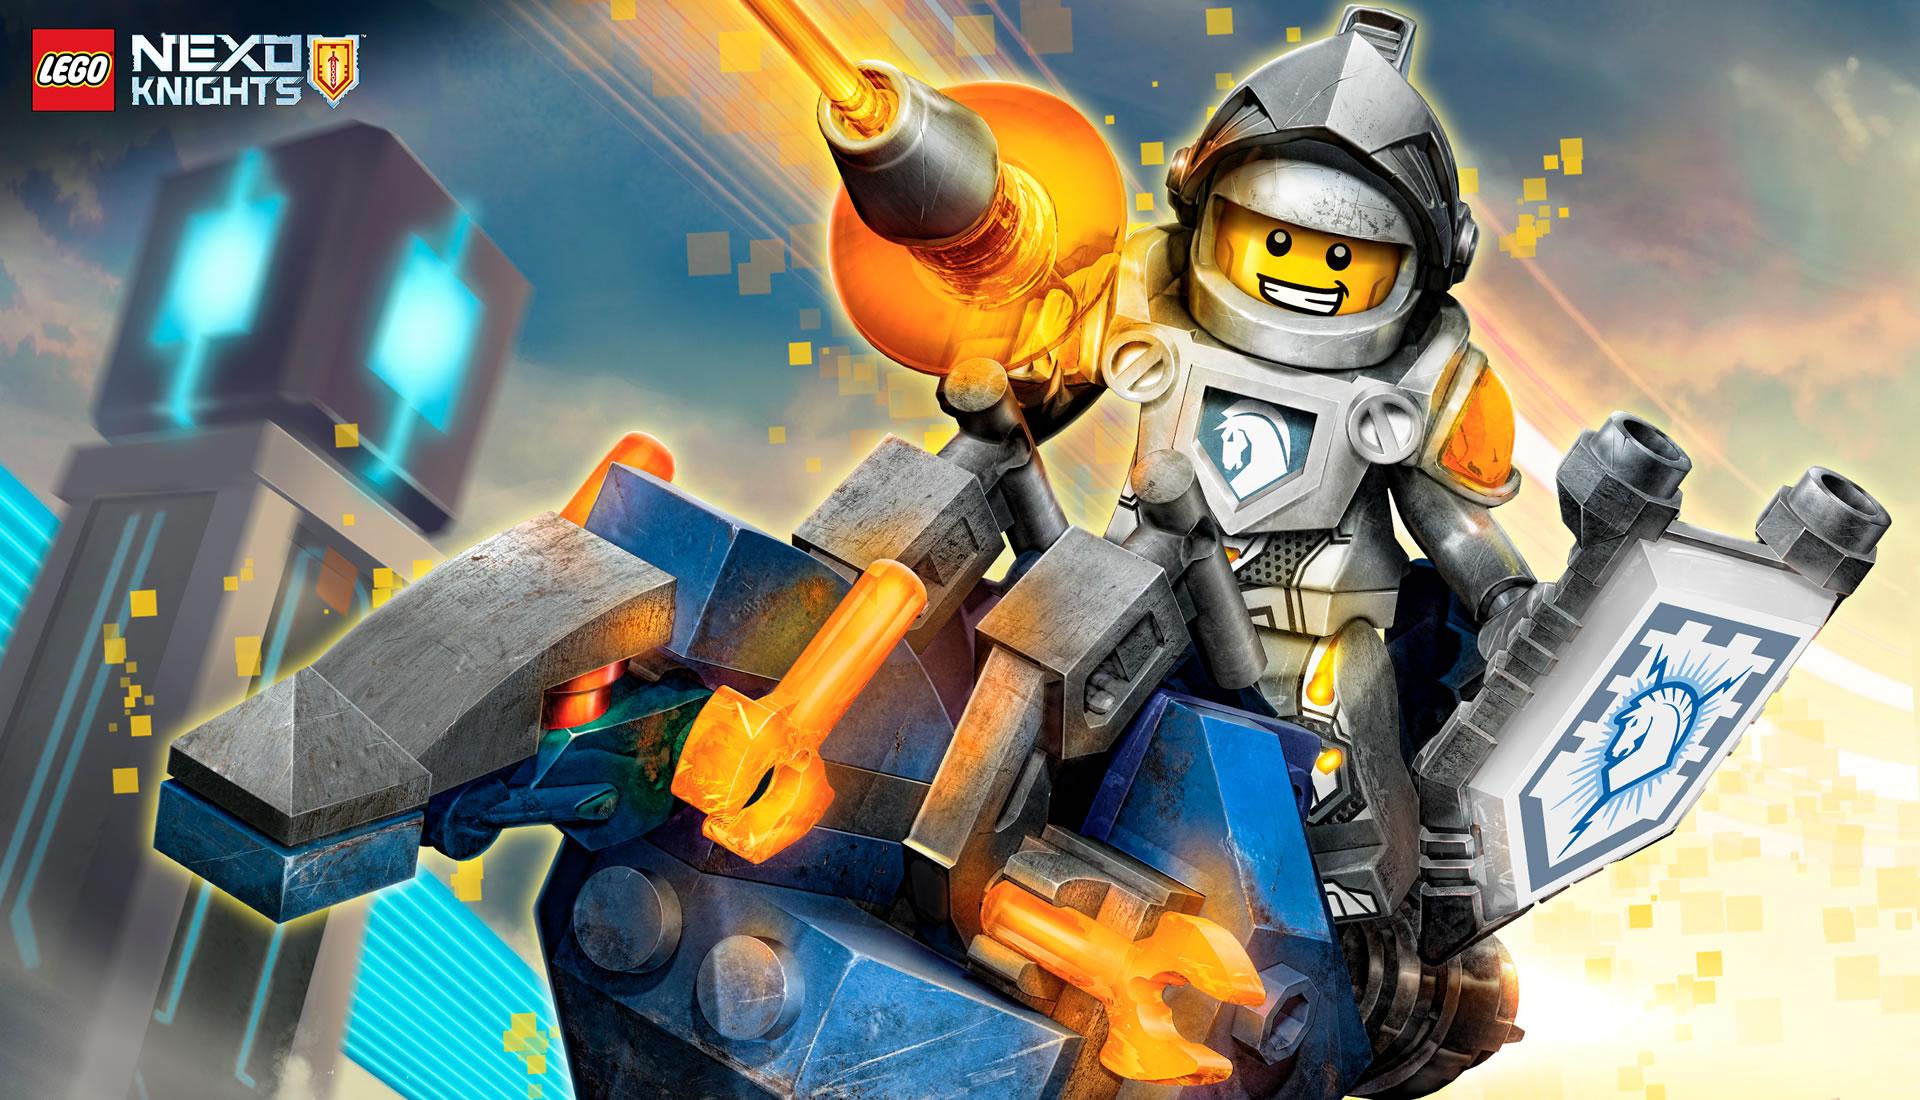 download wallpaper: LEGO Nexo Knights wallpaper